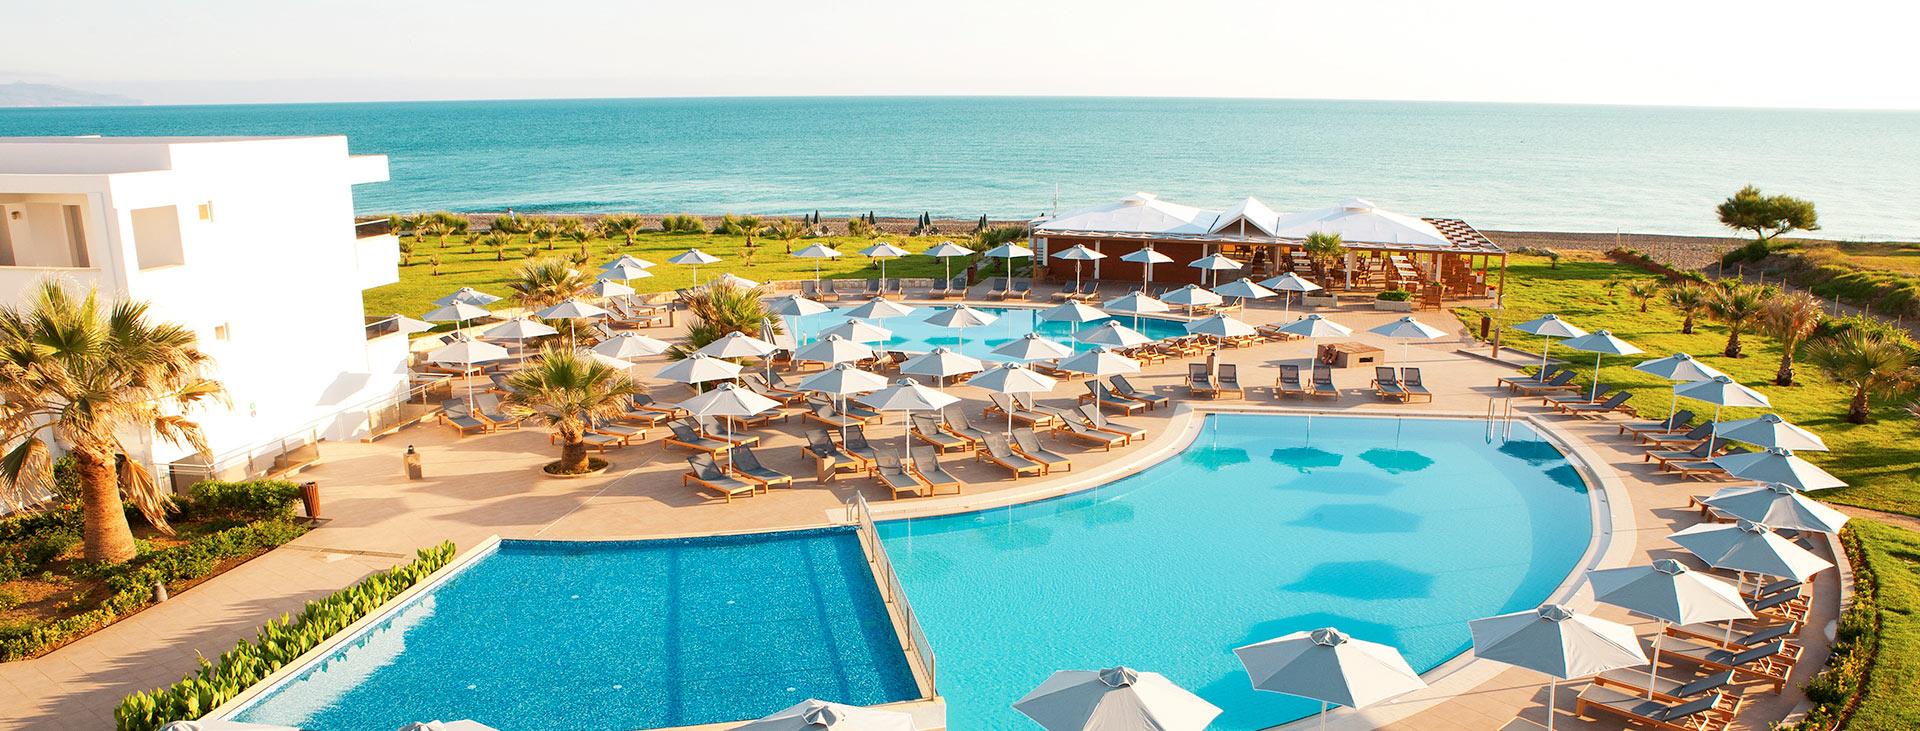 Sunprime Platanias Beach, Platanias (Chaniakysten), Kreta, Grækenland